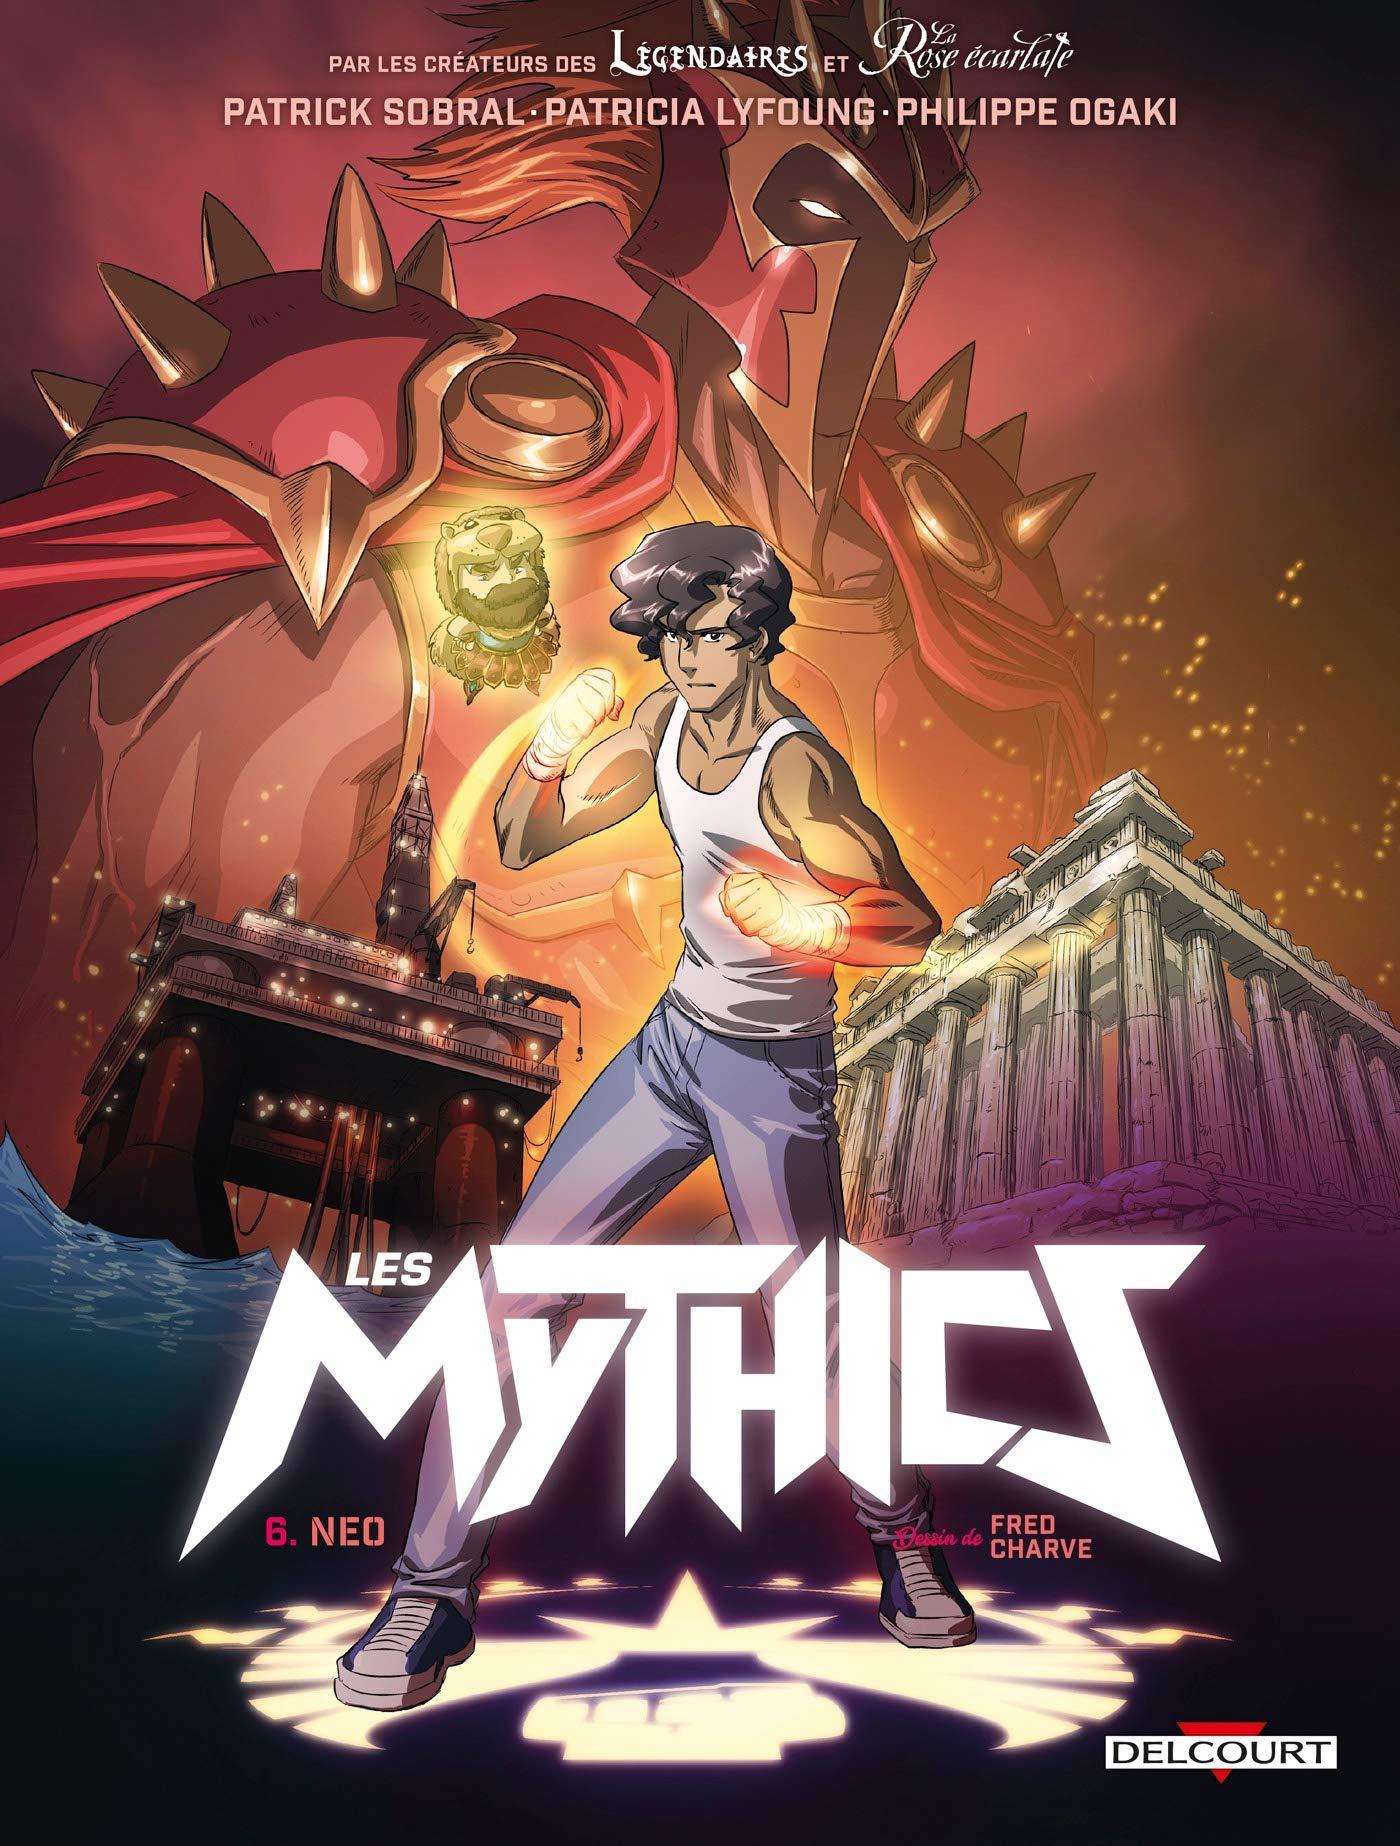 Les Mythics 6 - Neo